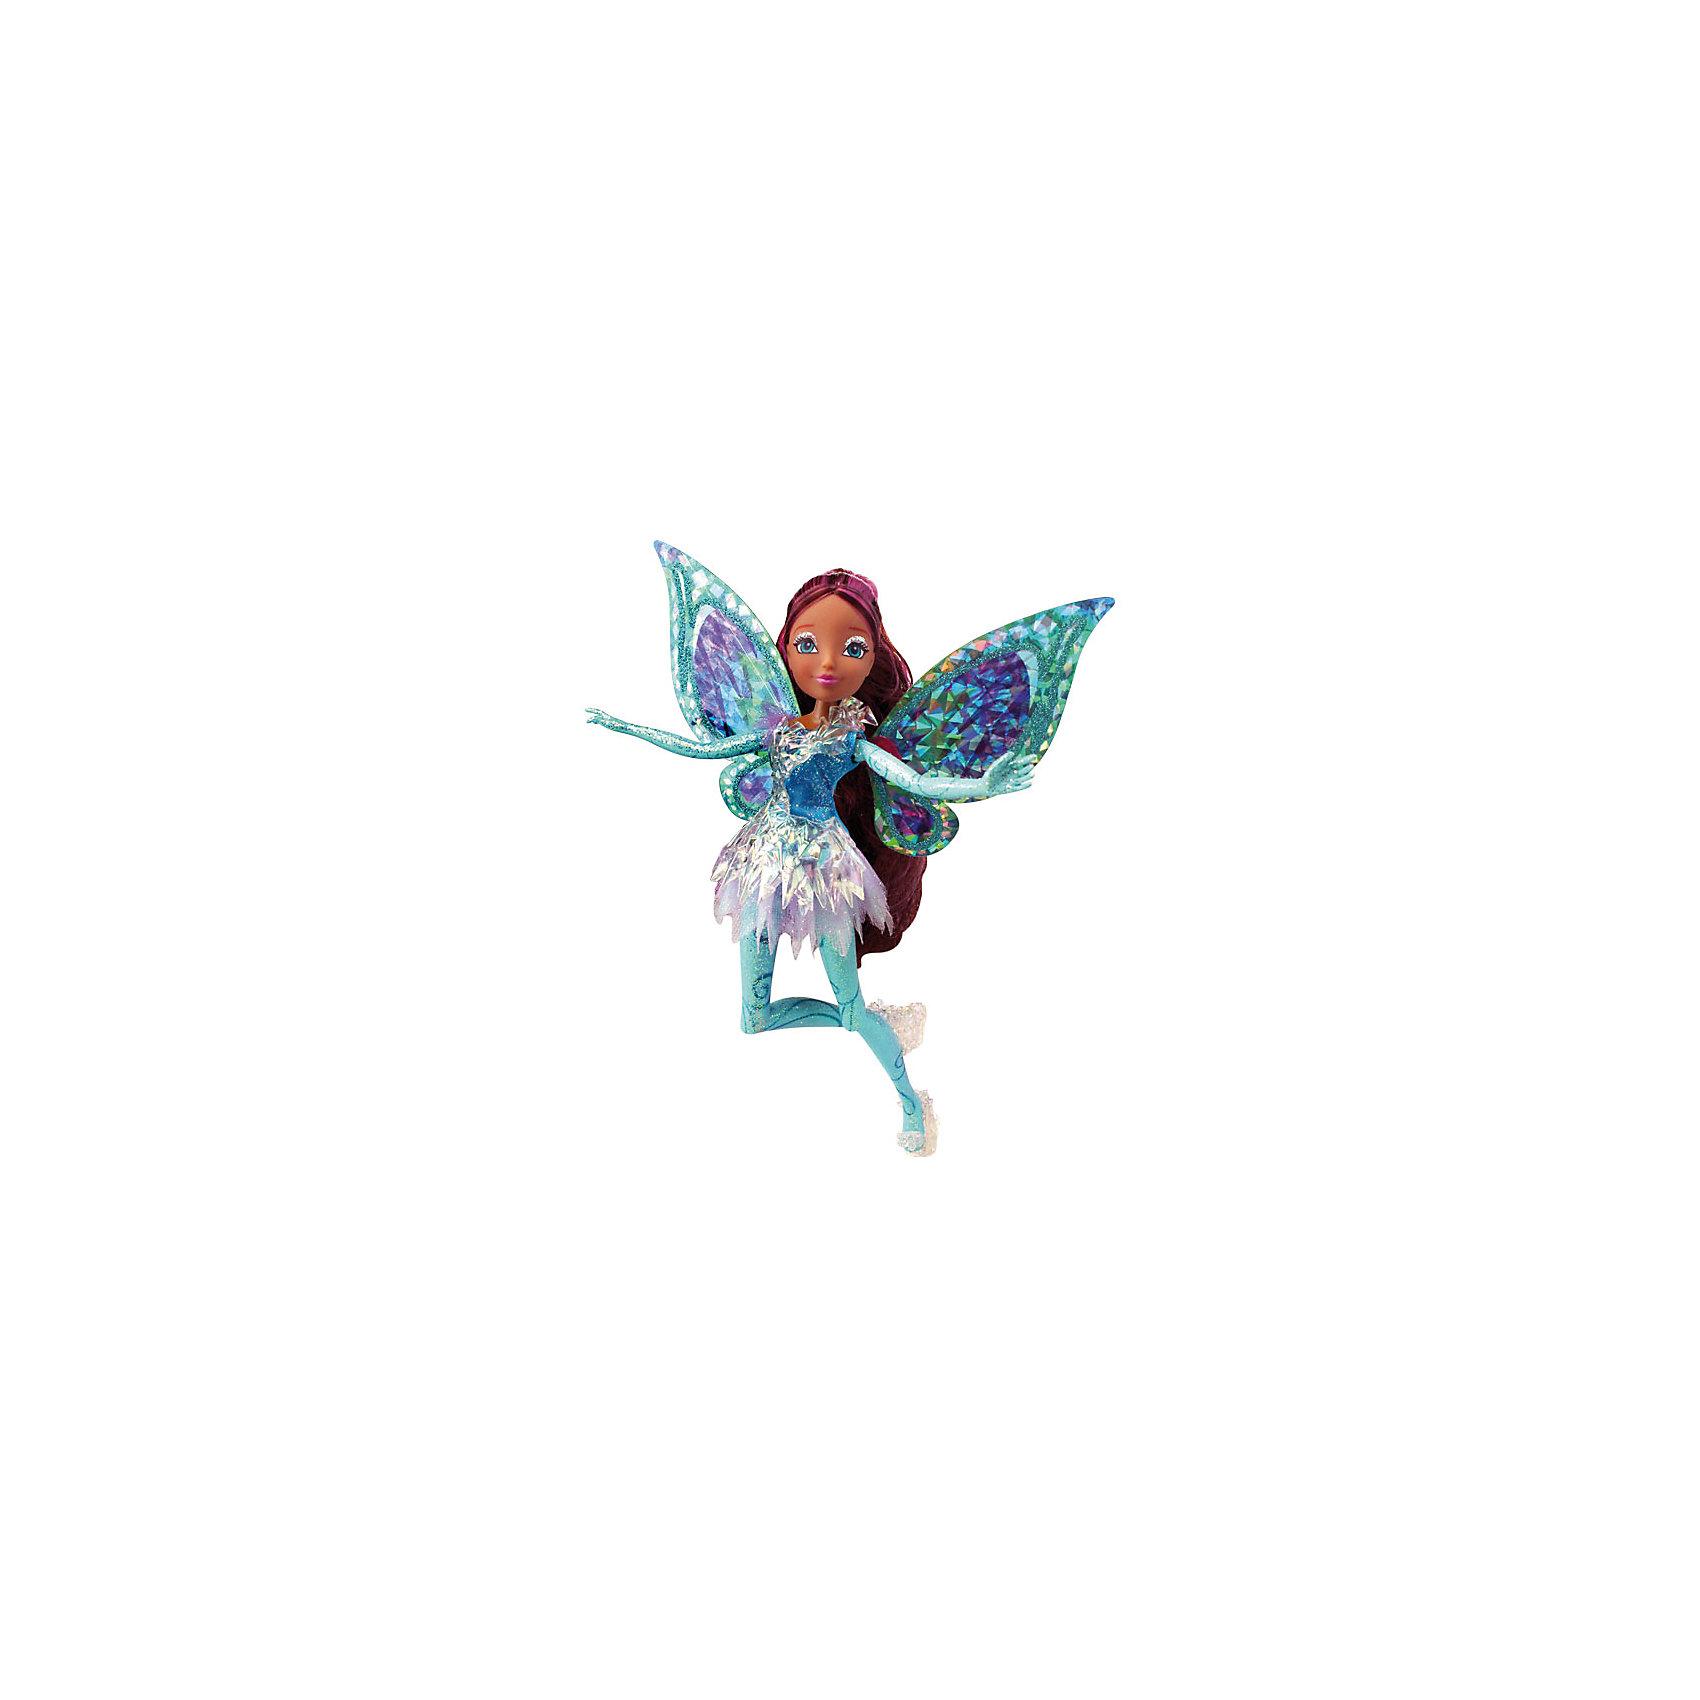 Gulliver Кукла Лейла, Тайникс, Winx Club gulliver игровой набор блум волшебный трон winx club